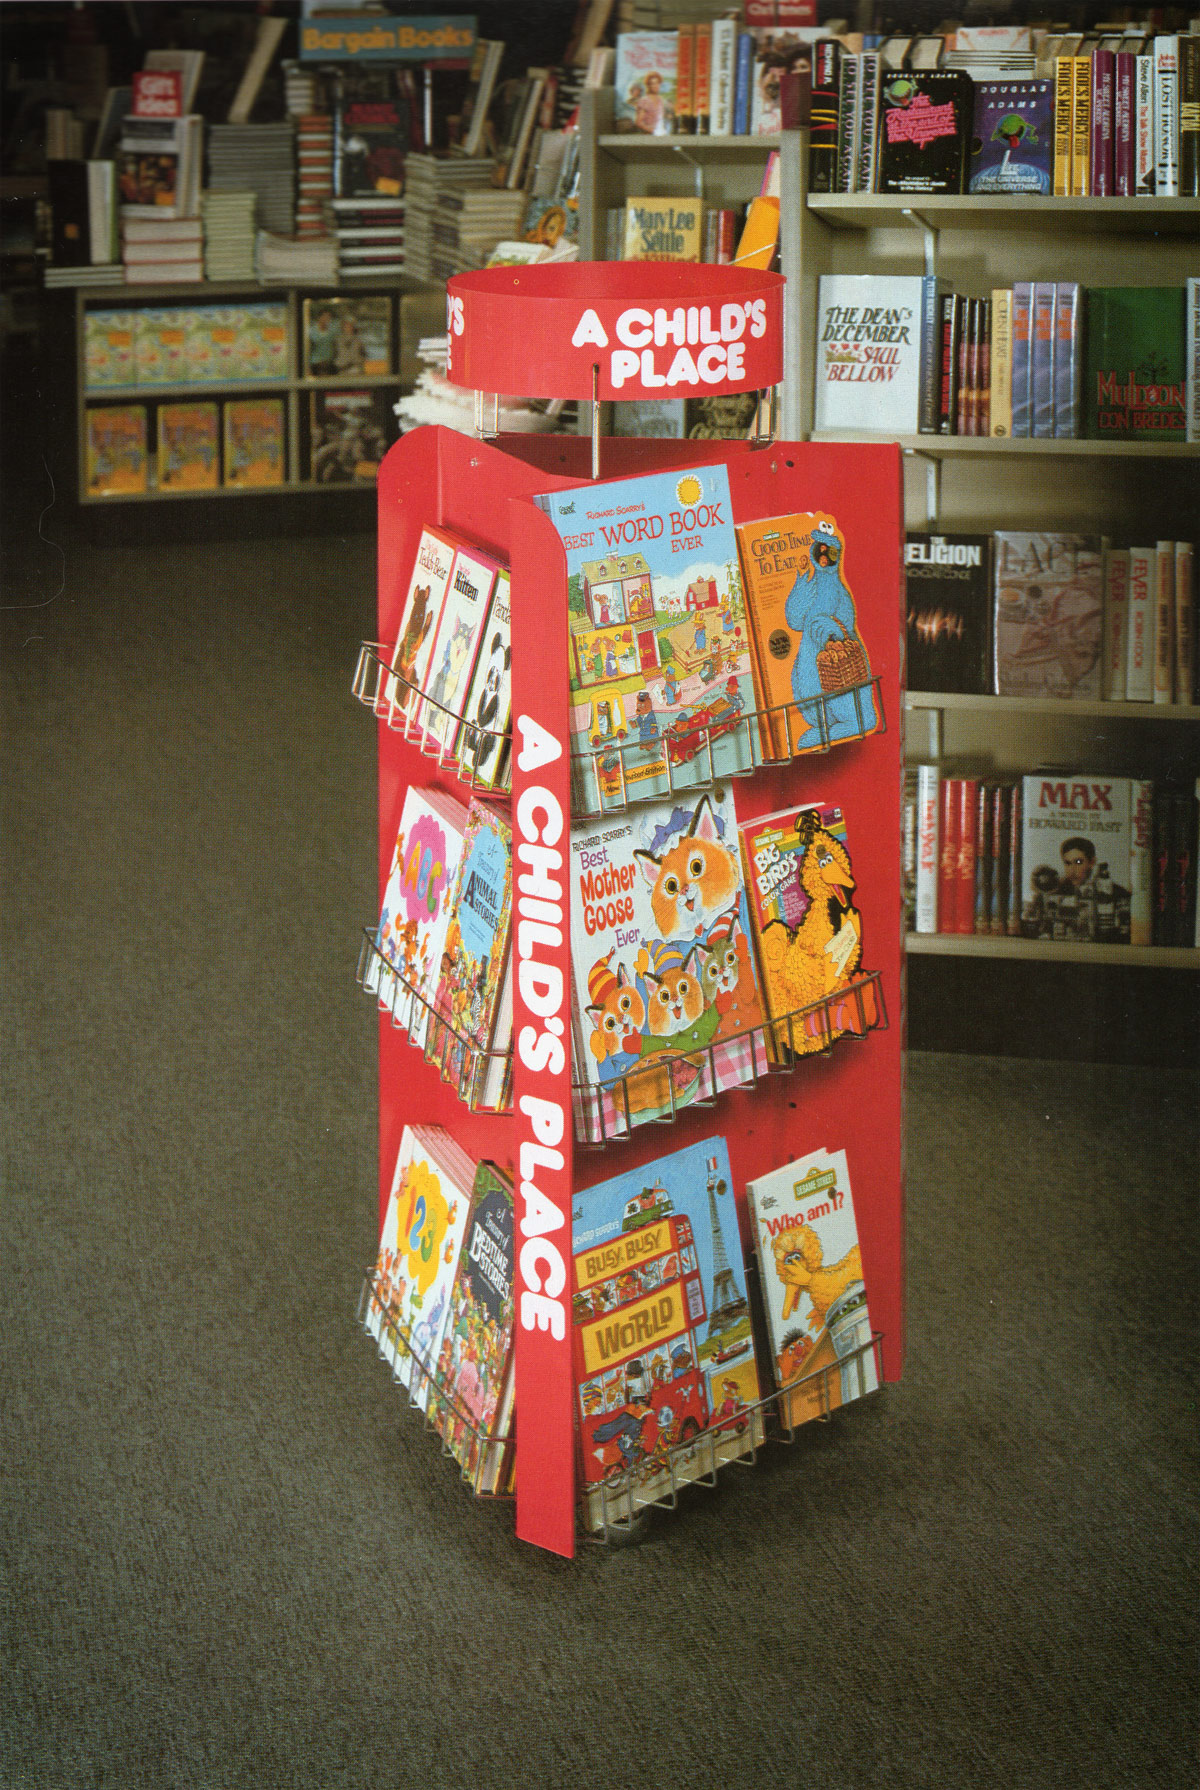 Waldenbooks In store children's book display